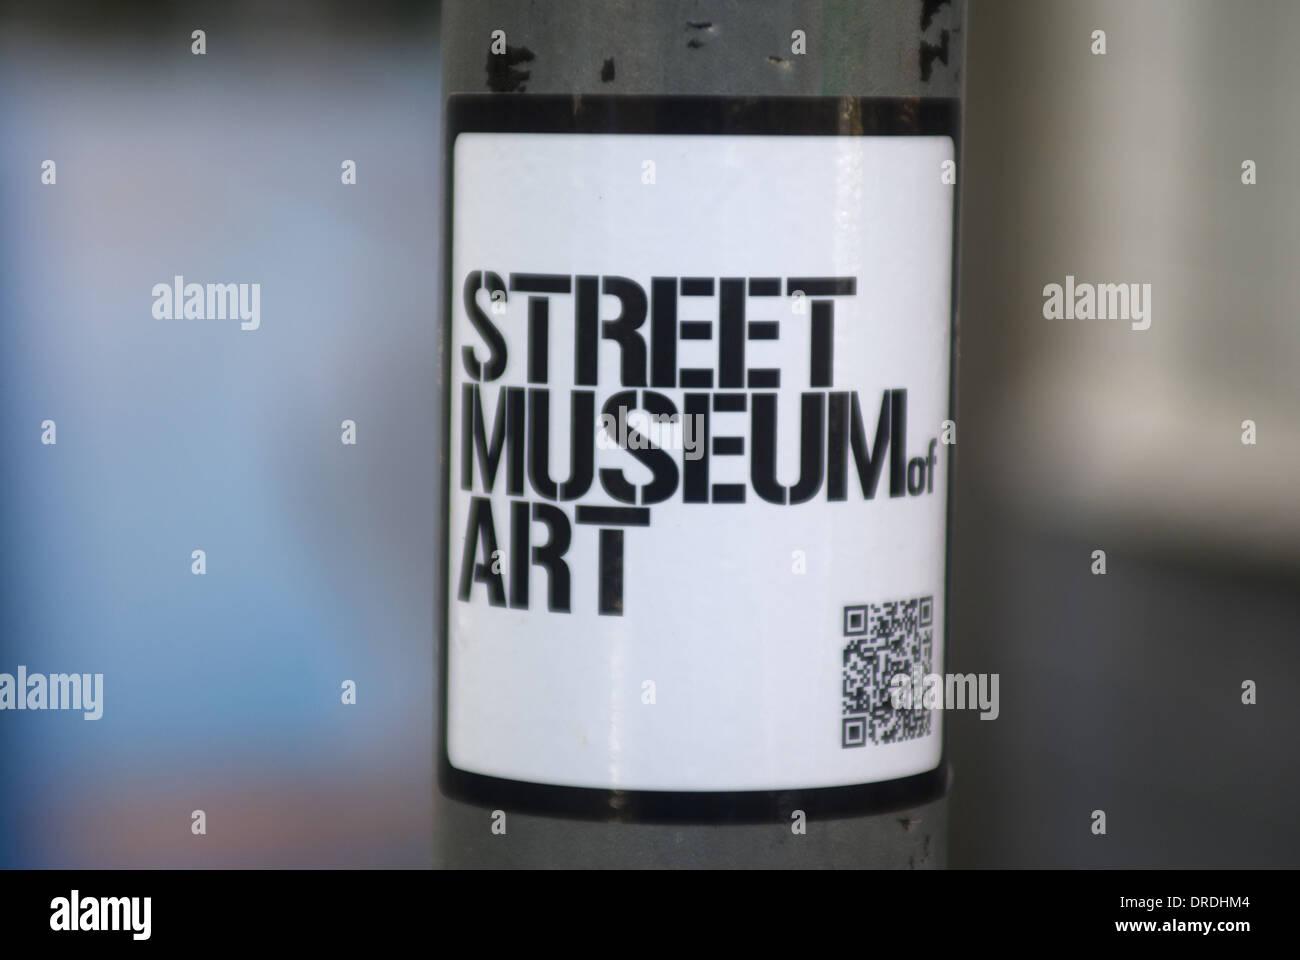 street art museum sticker - Stock Image